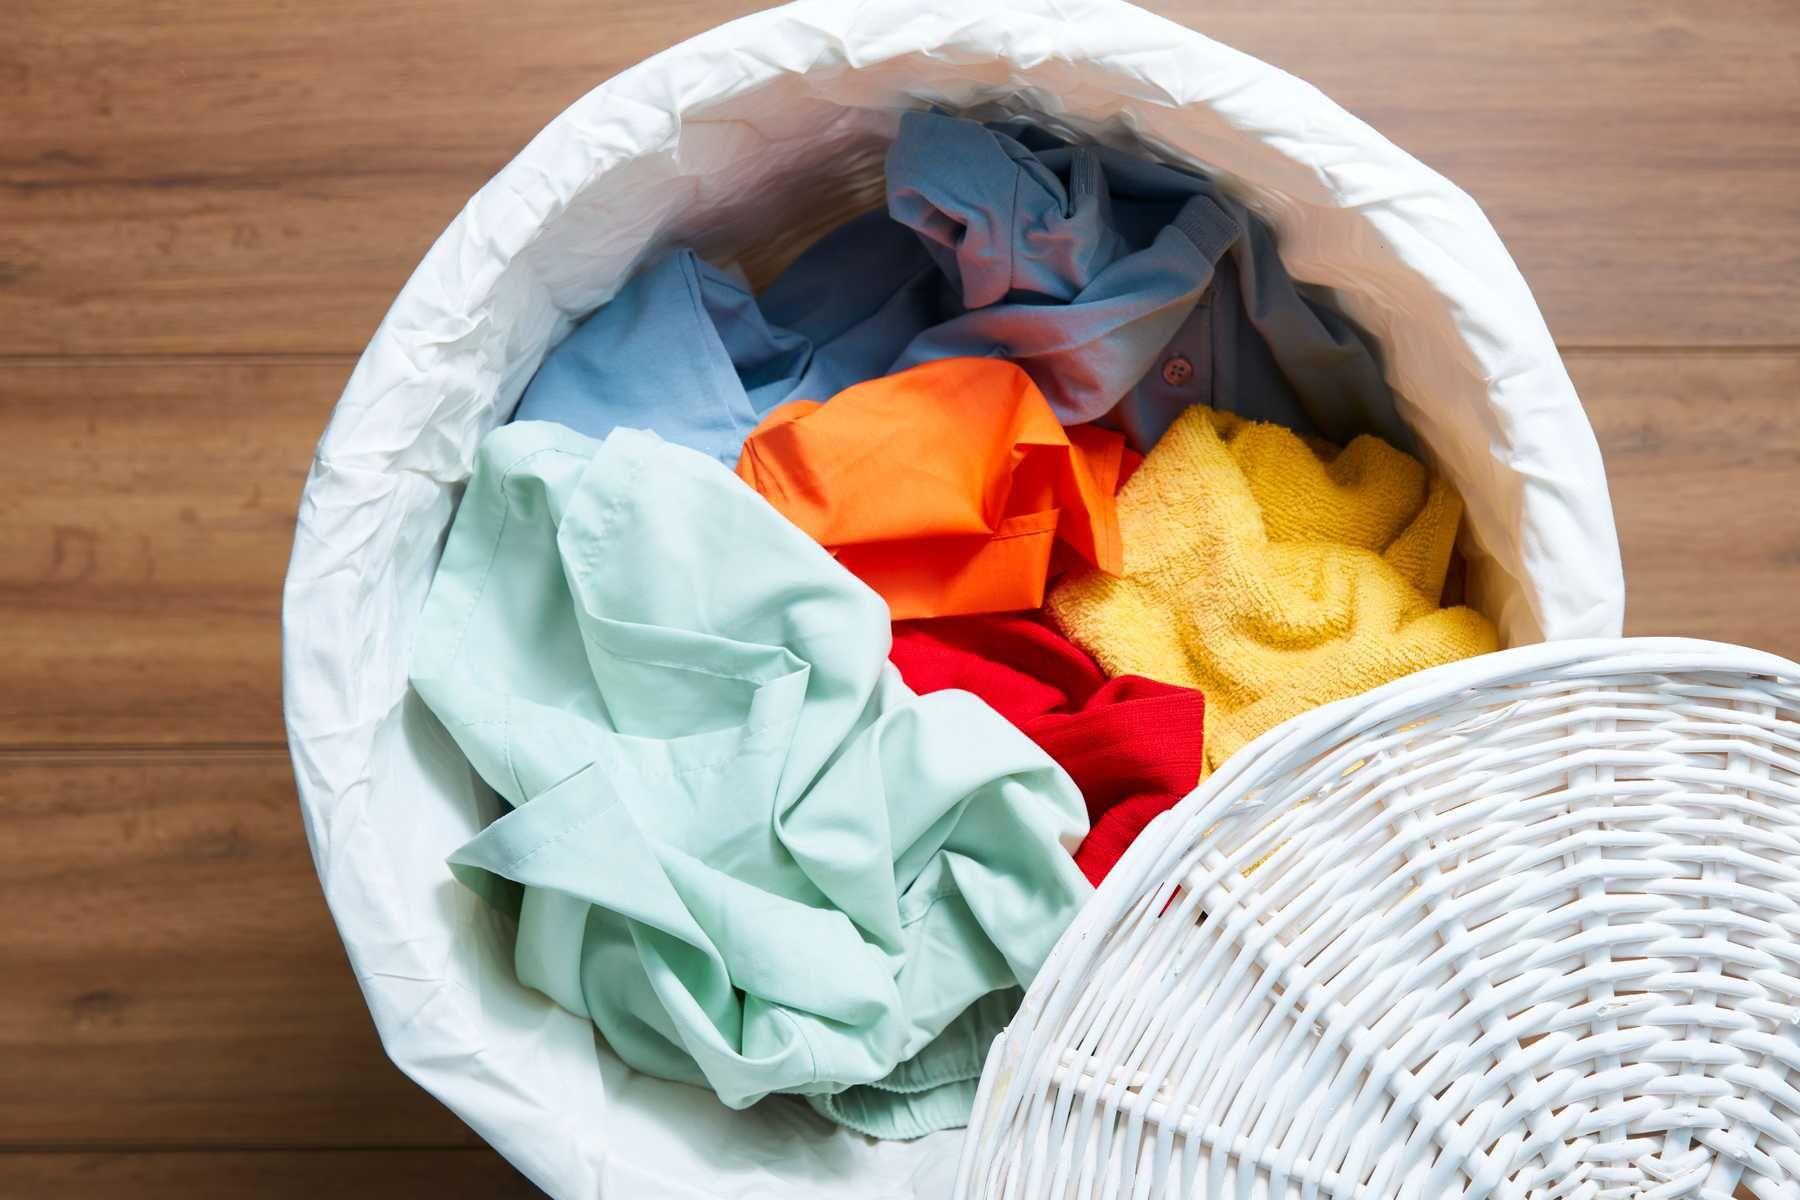 Penting! Begini Cara Mudah Cuci Pakaian dari Noda Lumpur Akibat Banjir